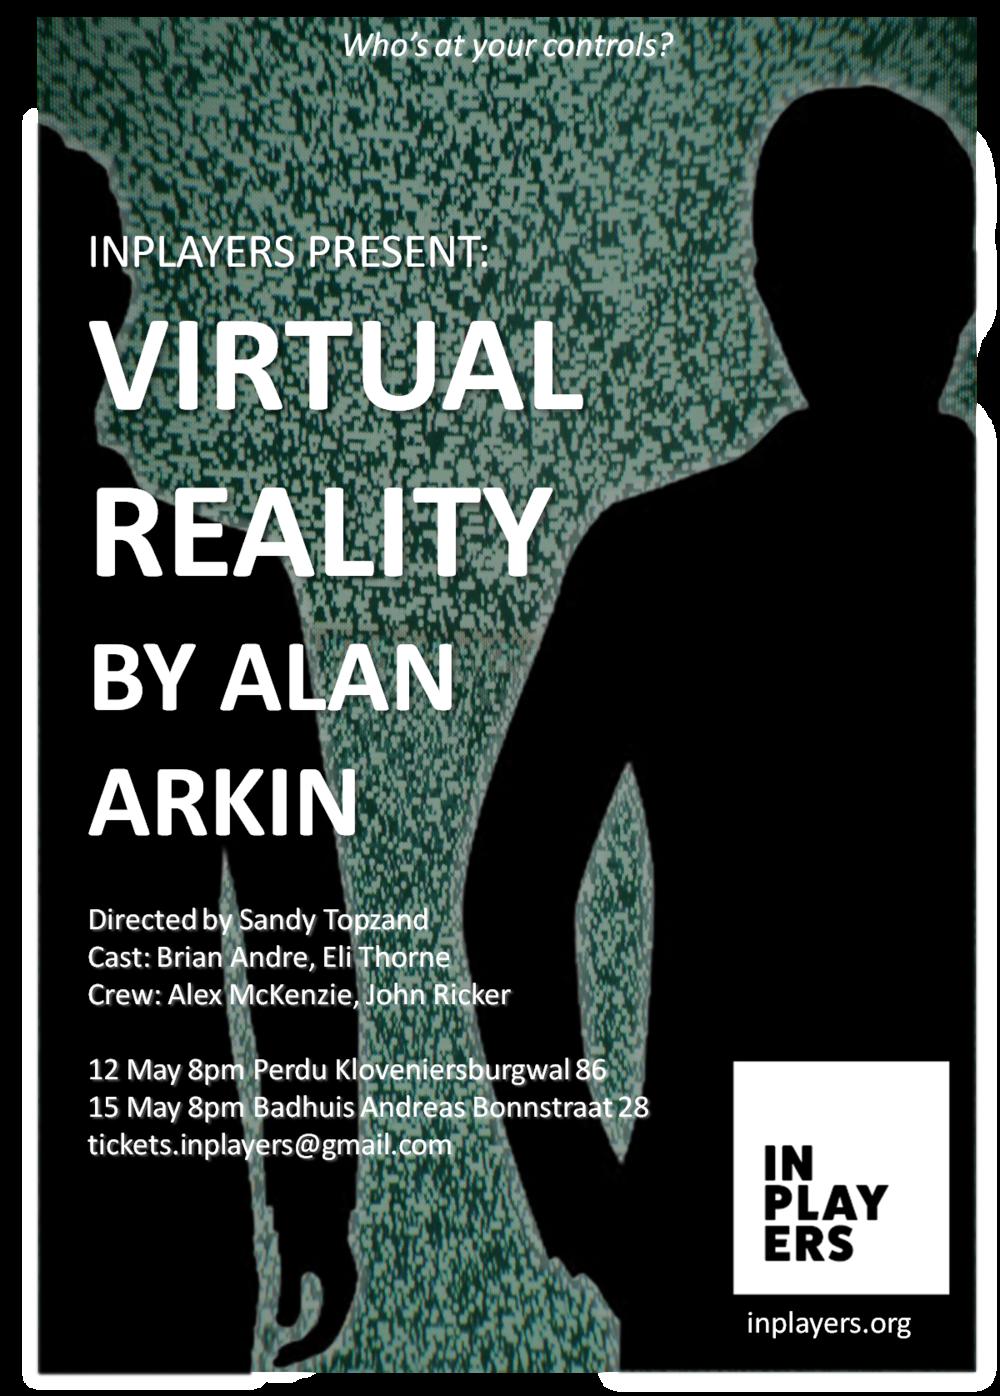 VirtualReality_Poster_3.png